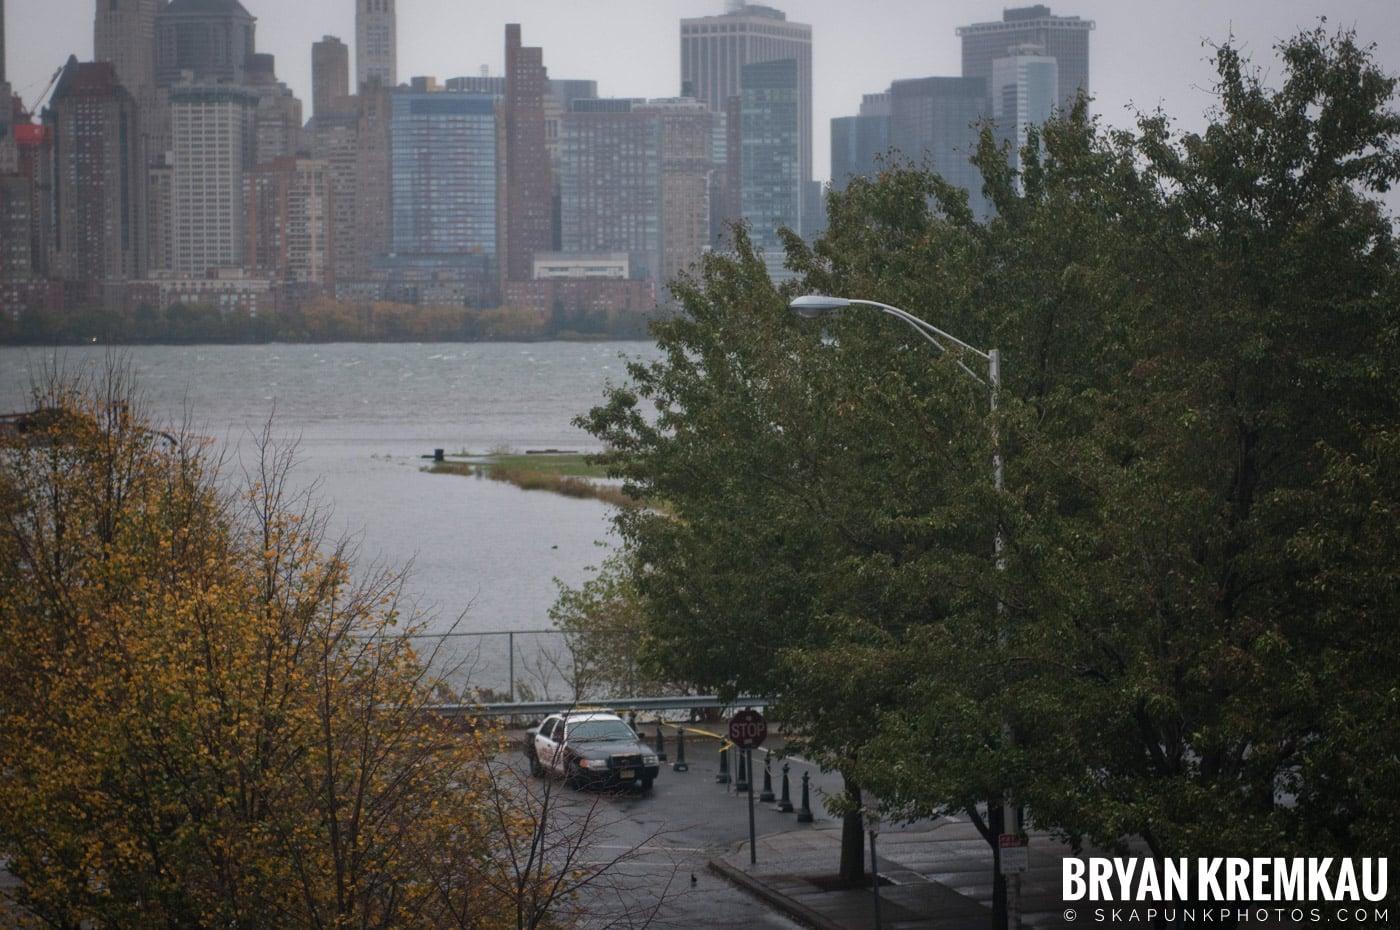 Hurricane Sandy 2012 @ Paulus Hook, Jersey City - 10.29.12 - 10.30.12 (56)